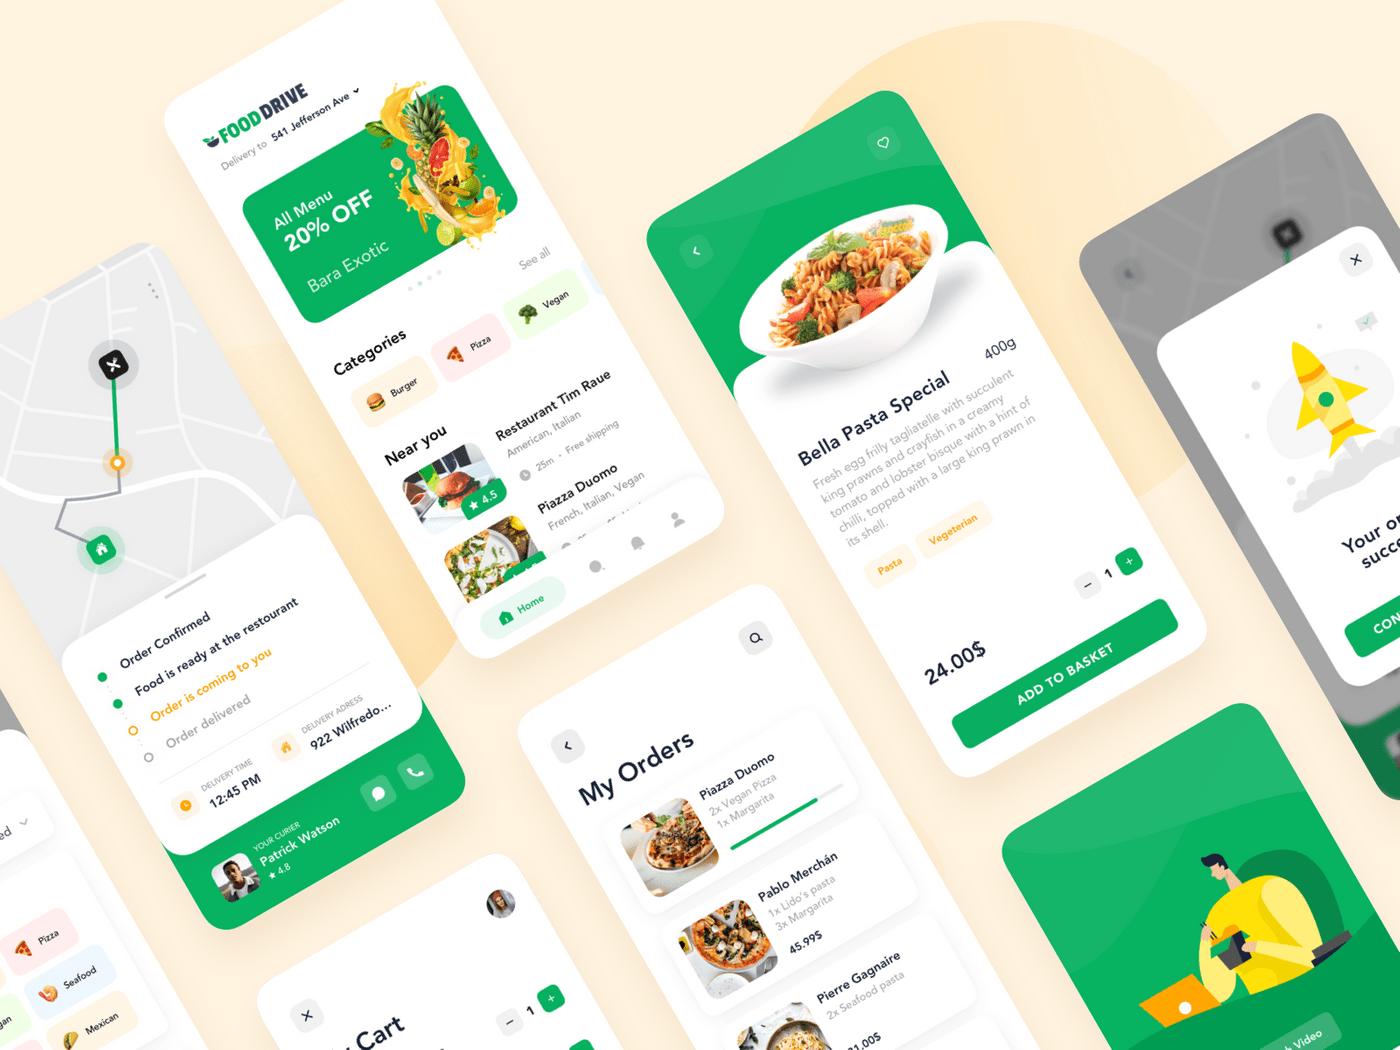 Build an on-demand app: Create prototypes